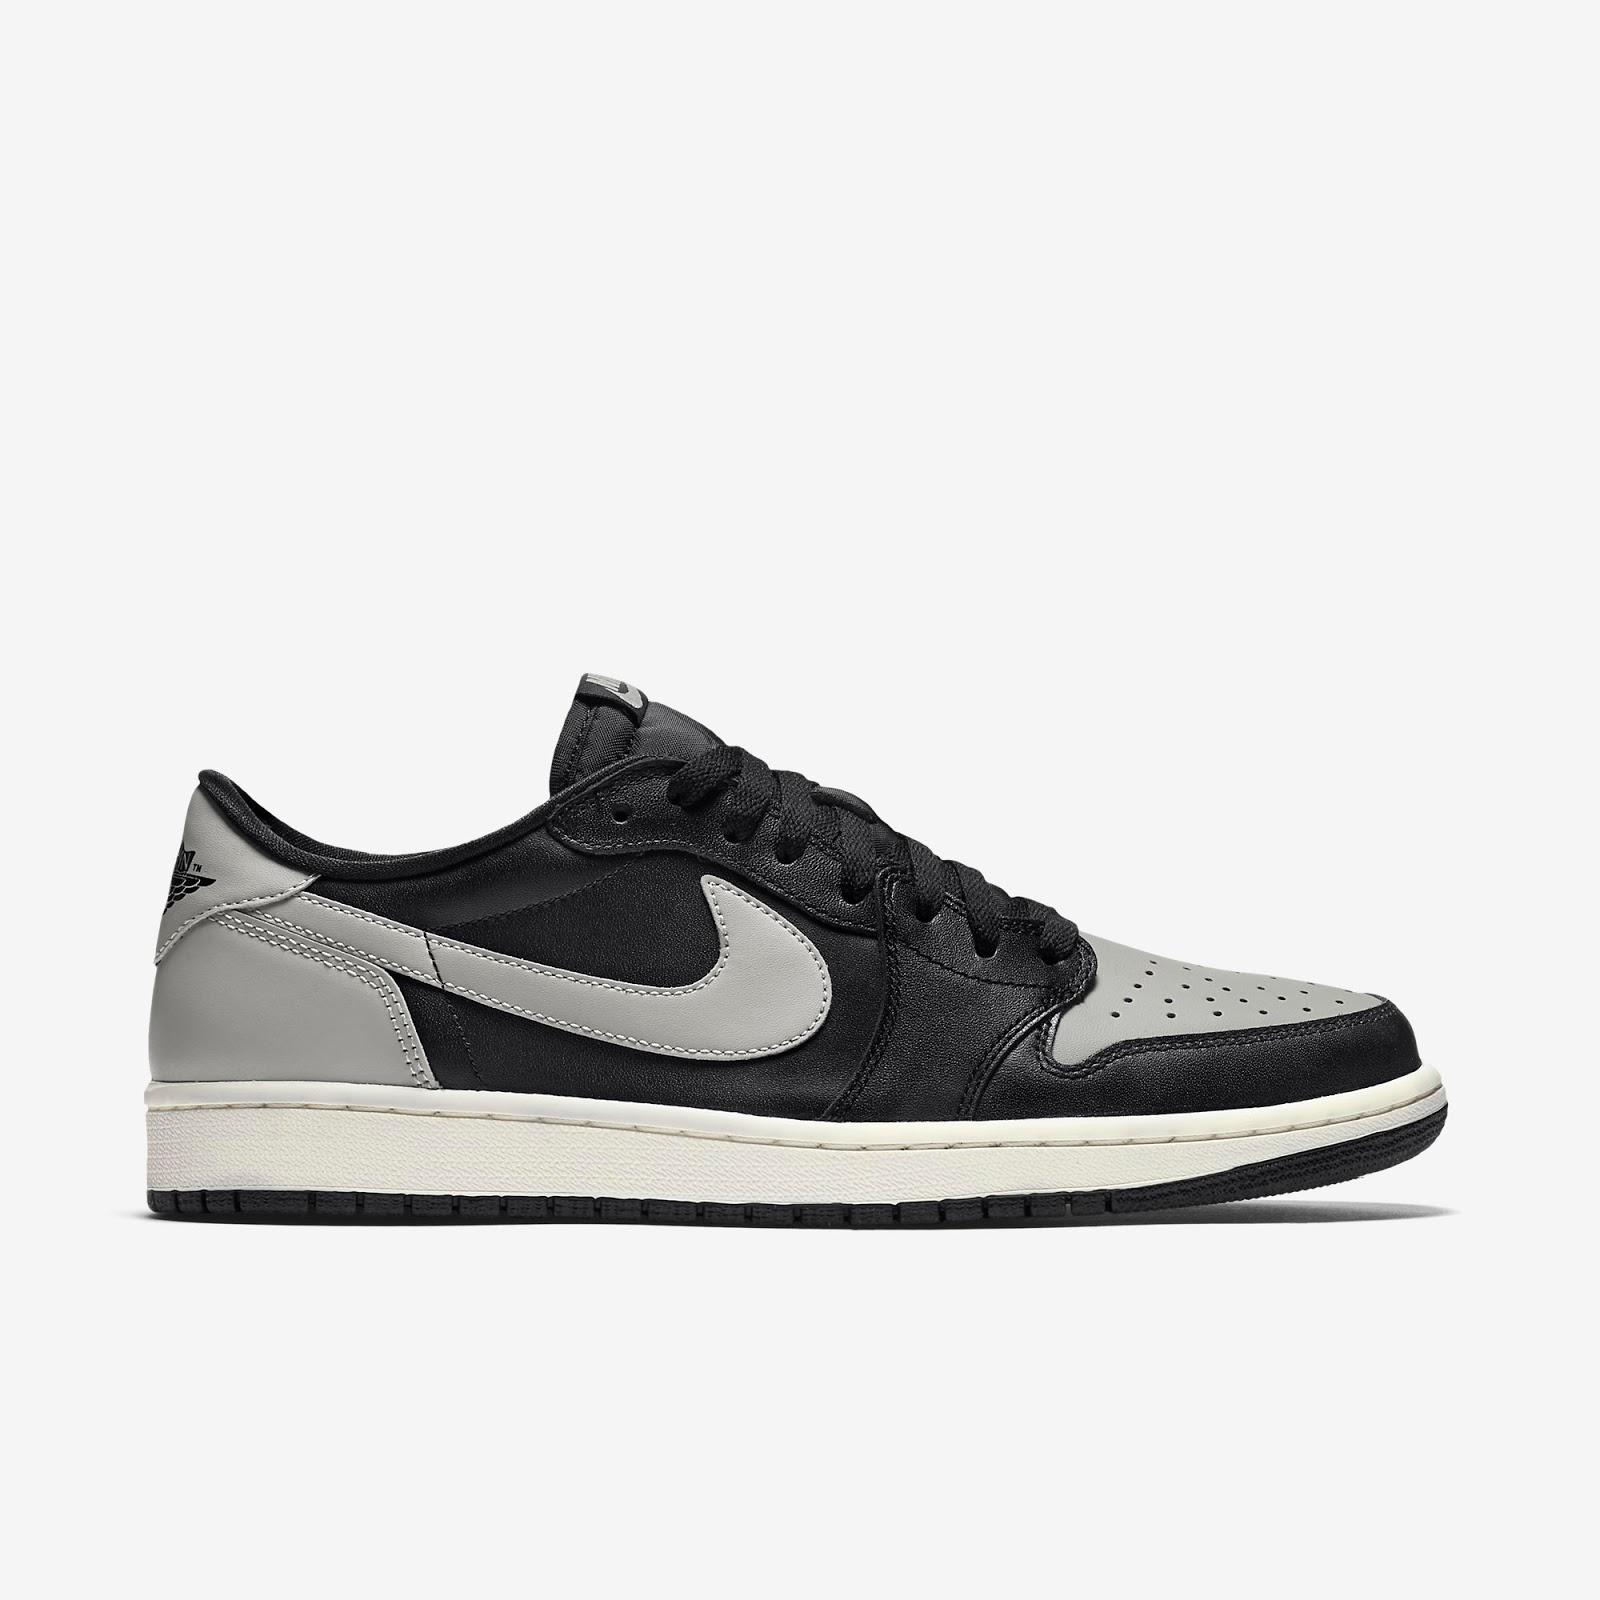 sports shoes fc220 a5a3e ajordanxi Your  1 Source For Sneaker Release Dates  Air Jordan 1 ...